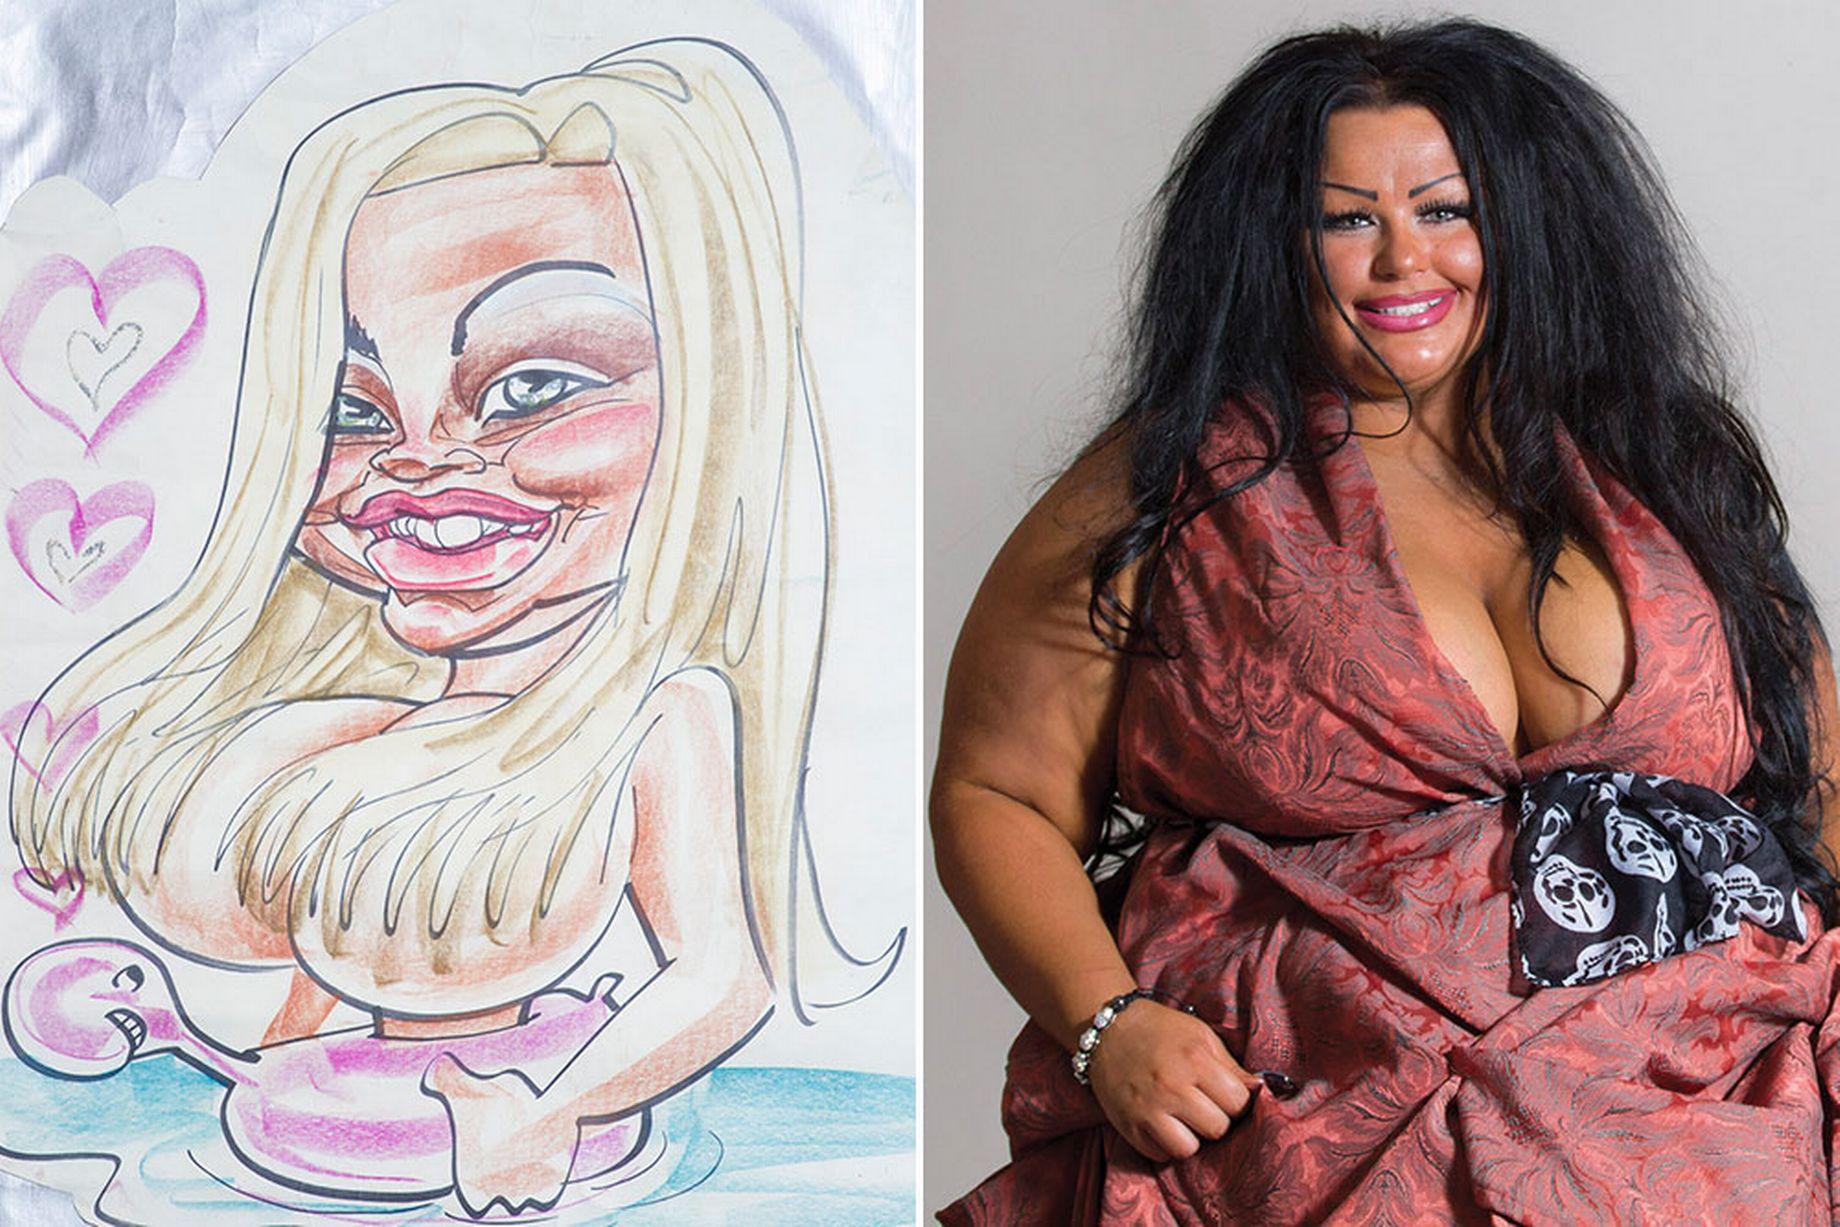 Krystina Butel caricature